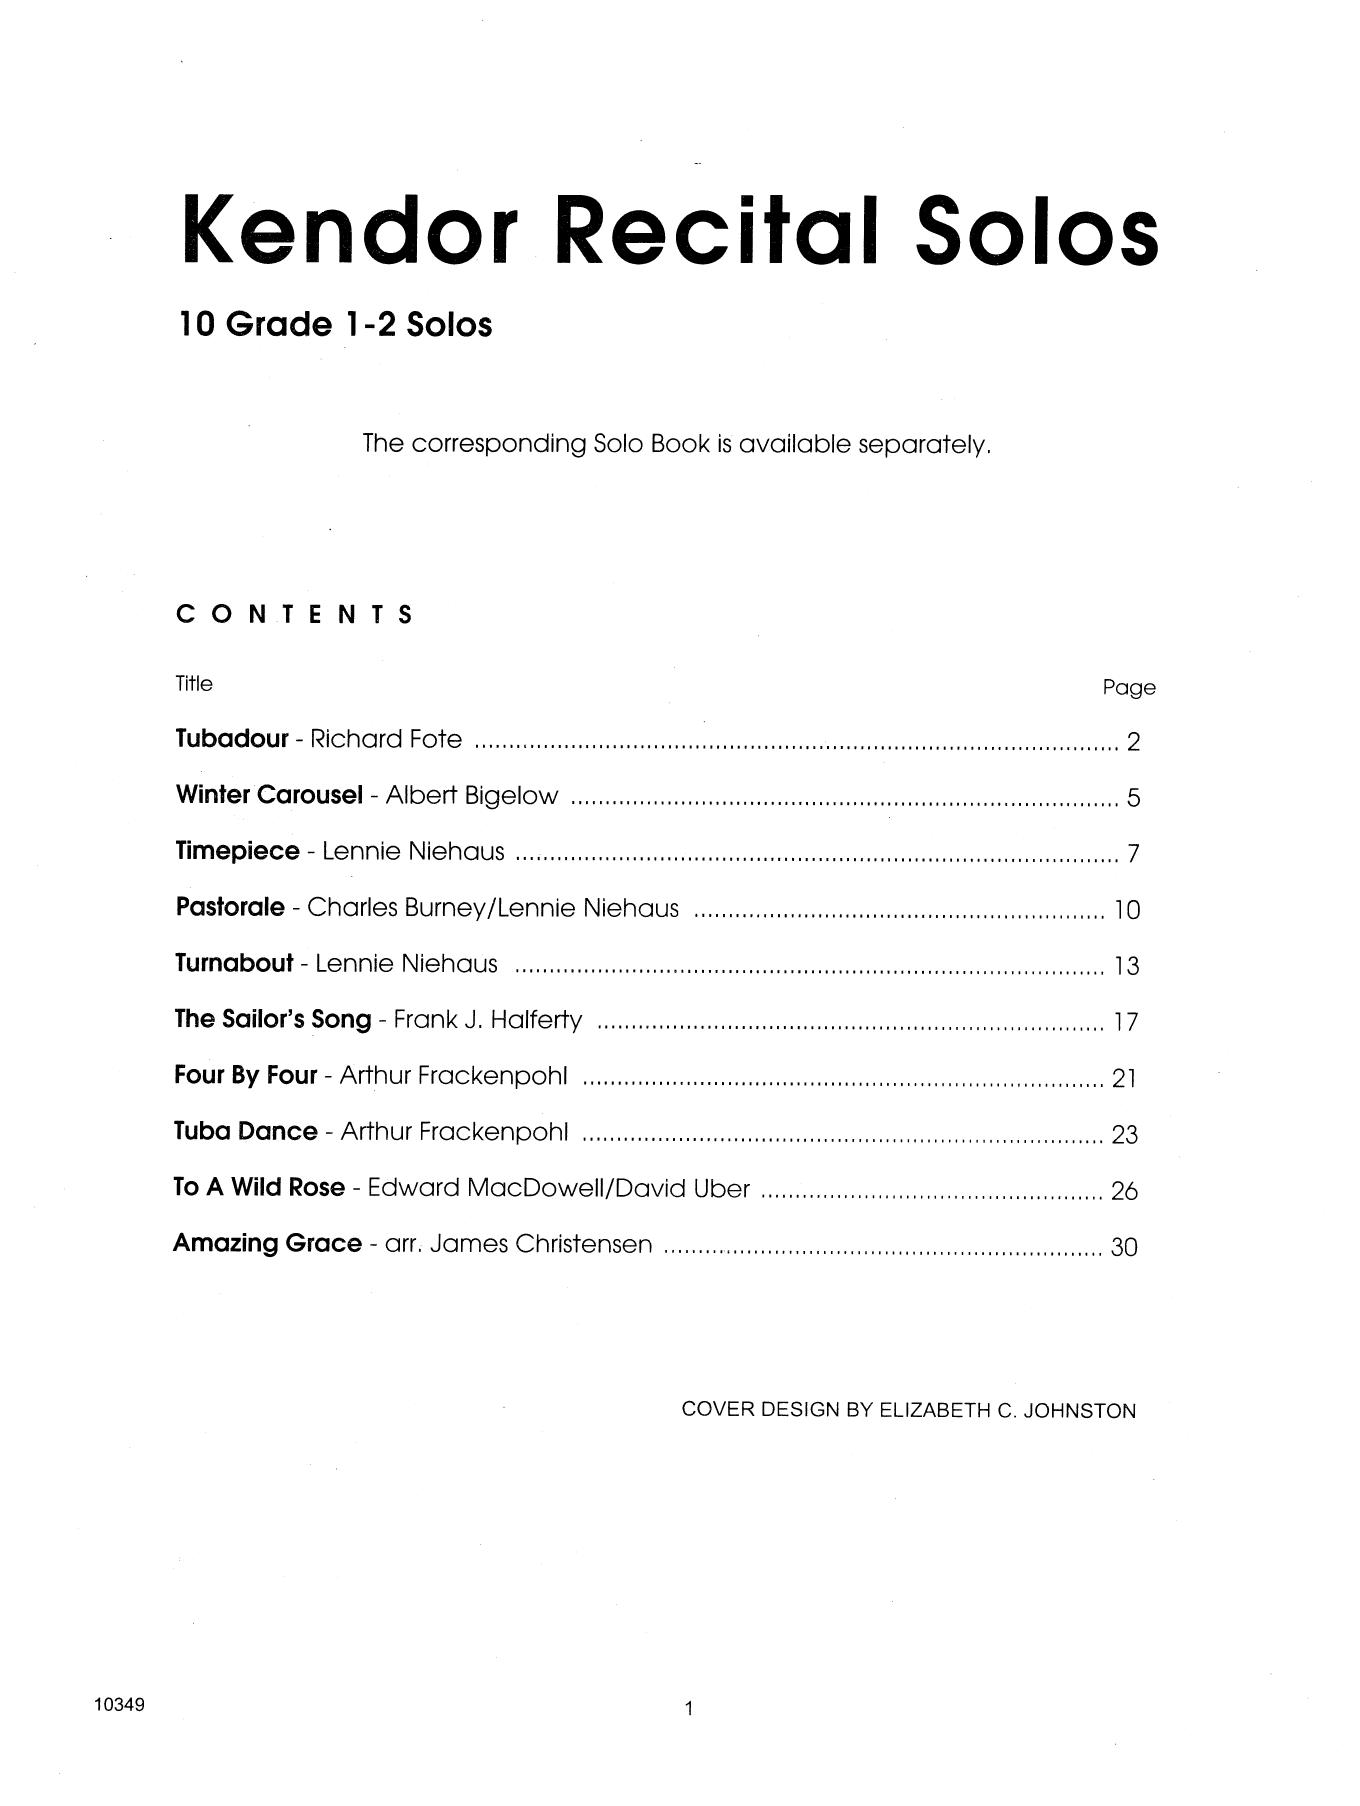 Kendor Recital Solos - Tuba - (Piano Accompaniment Sheet Music